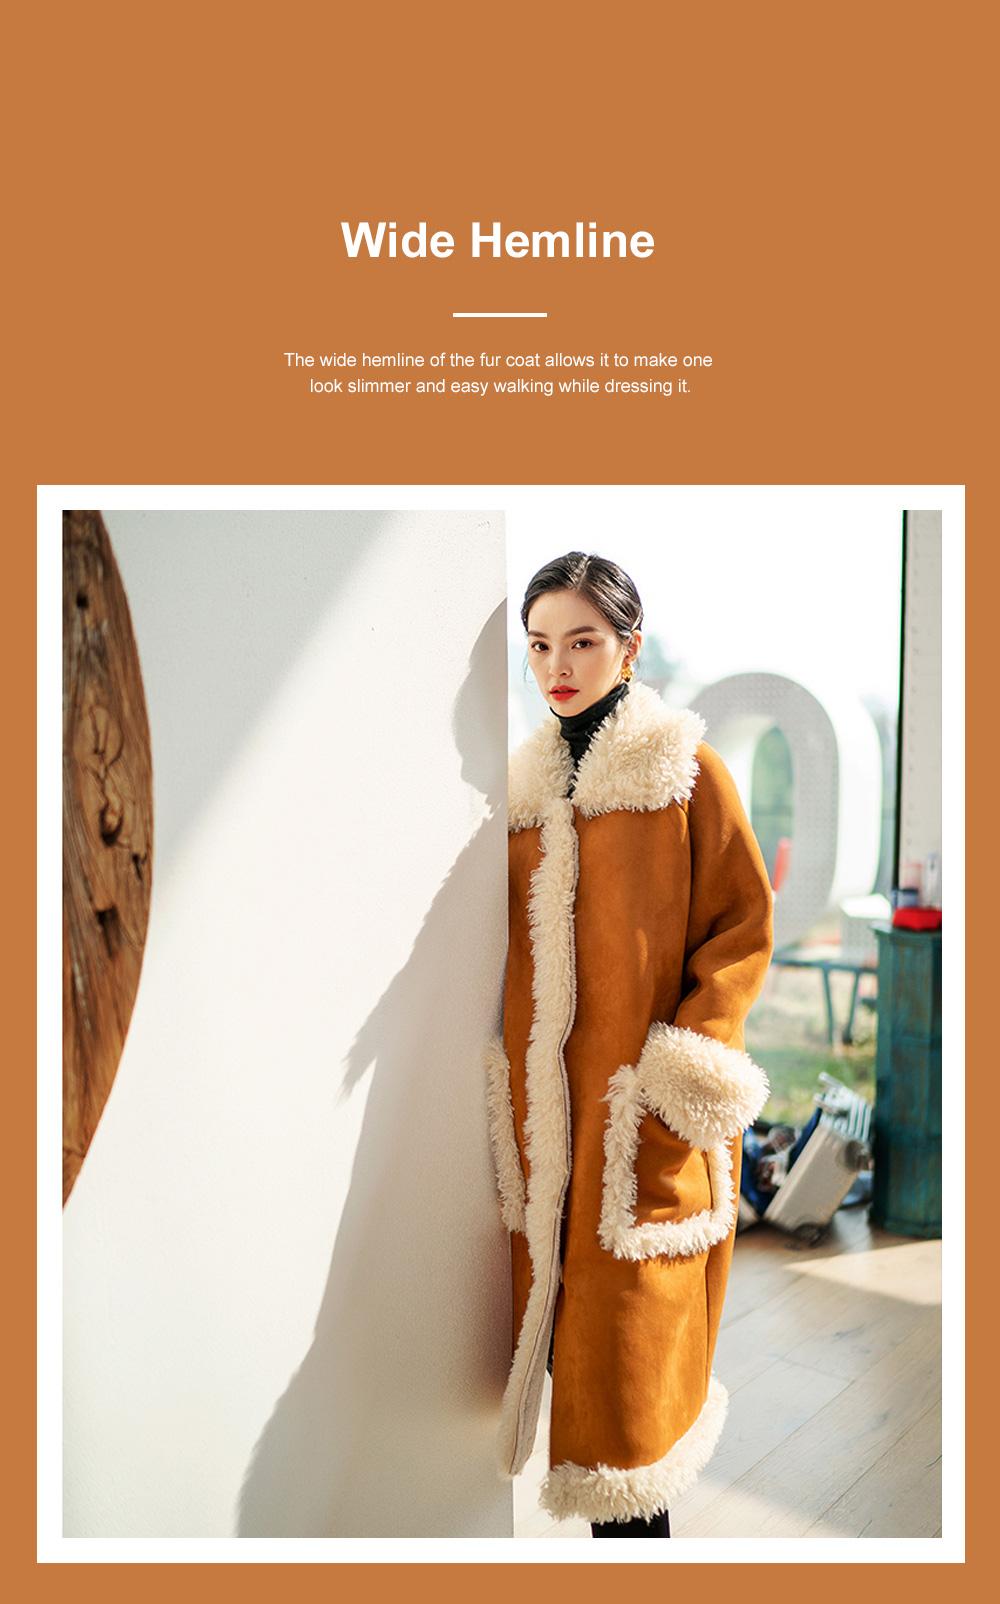 Fake Fur Long Coat for Women Wear Imitated Lamb Wool Great Coat Autumn Winter 2019 4